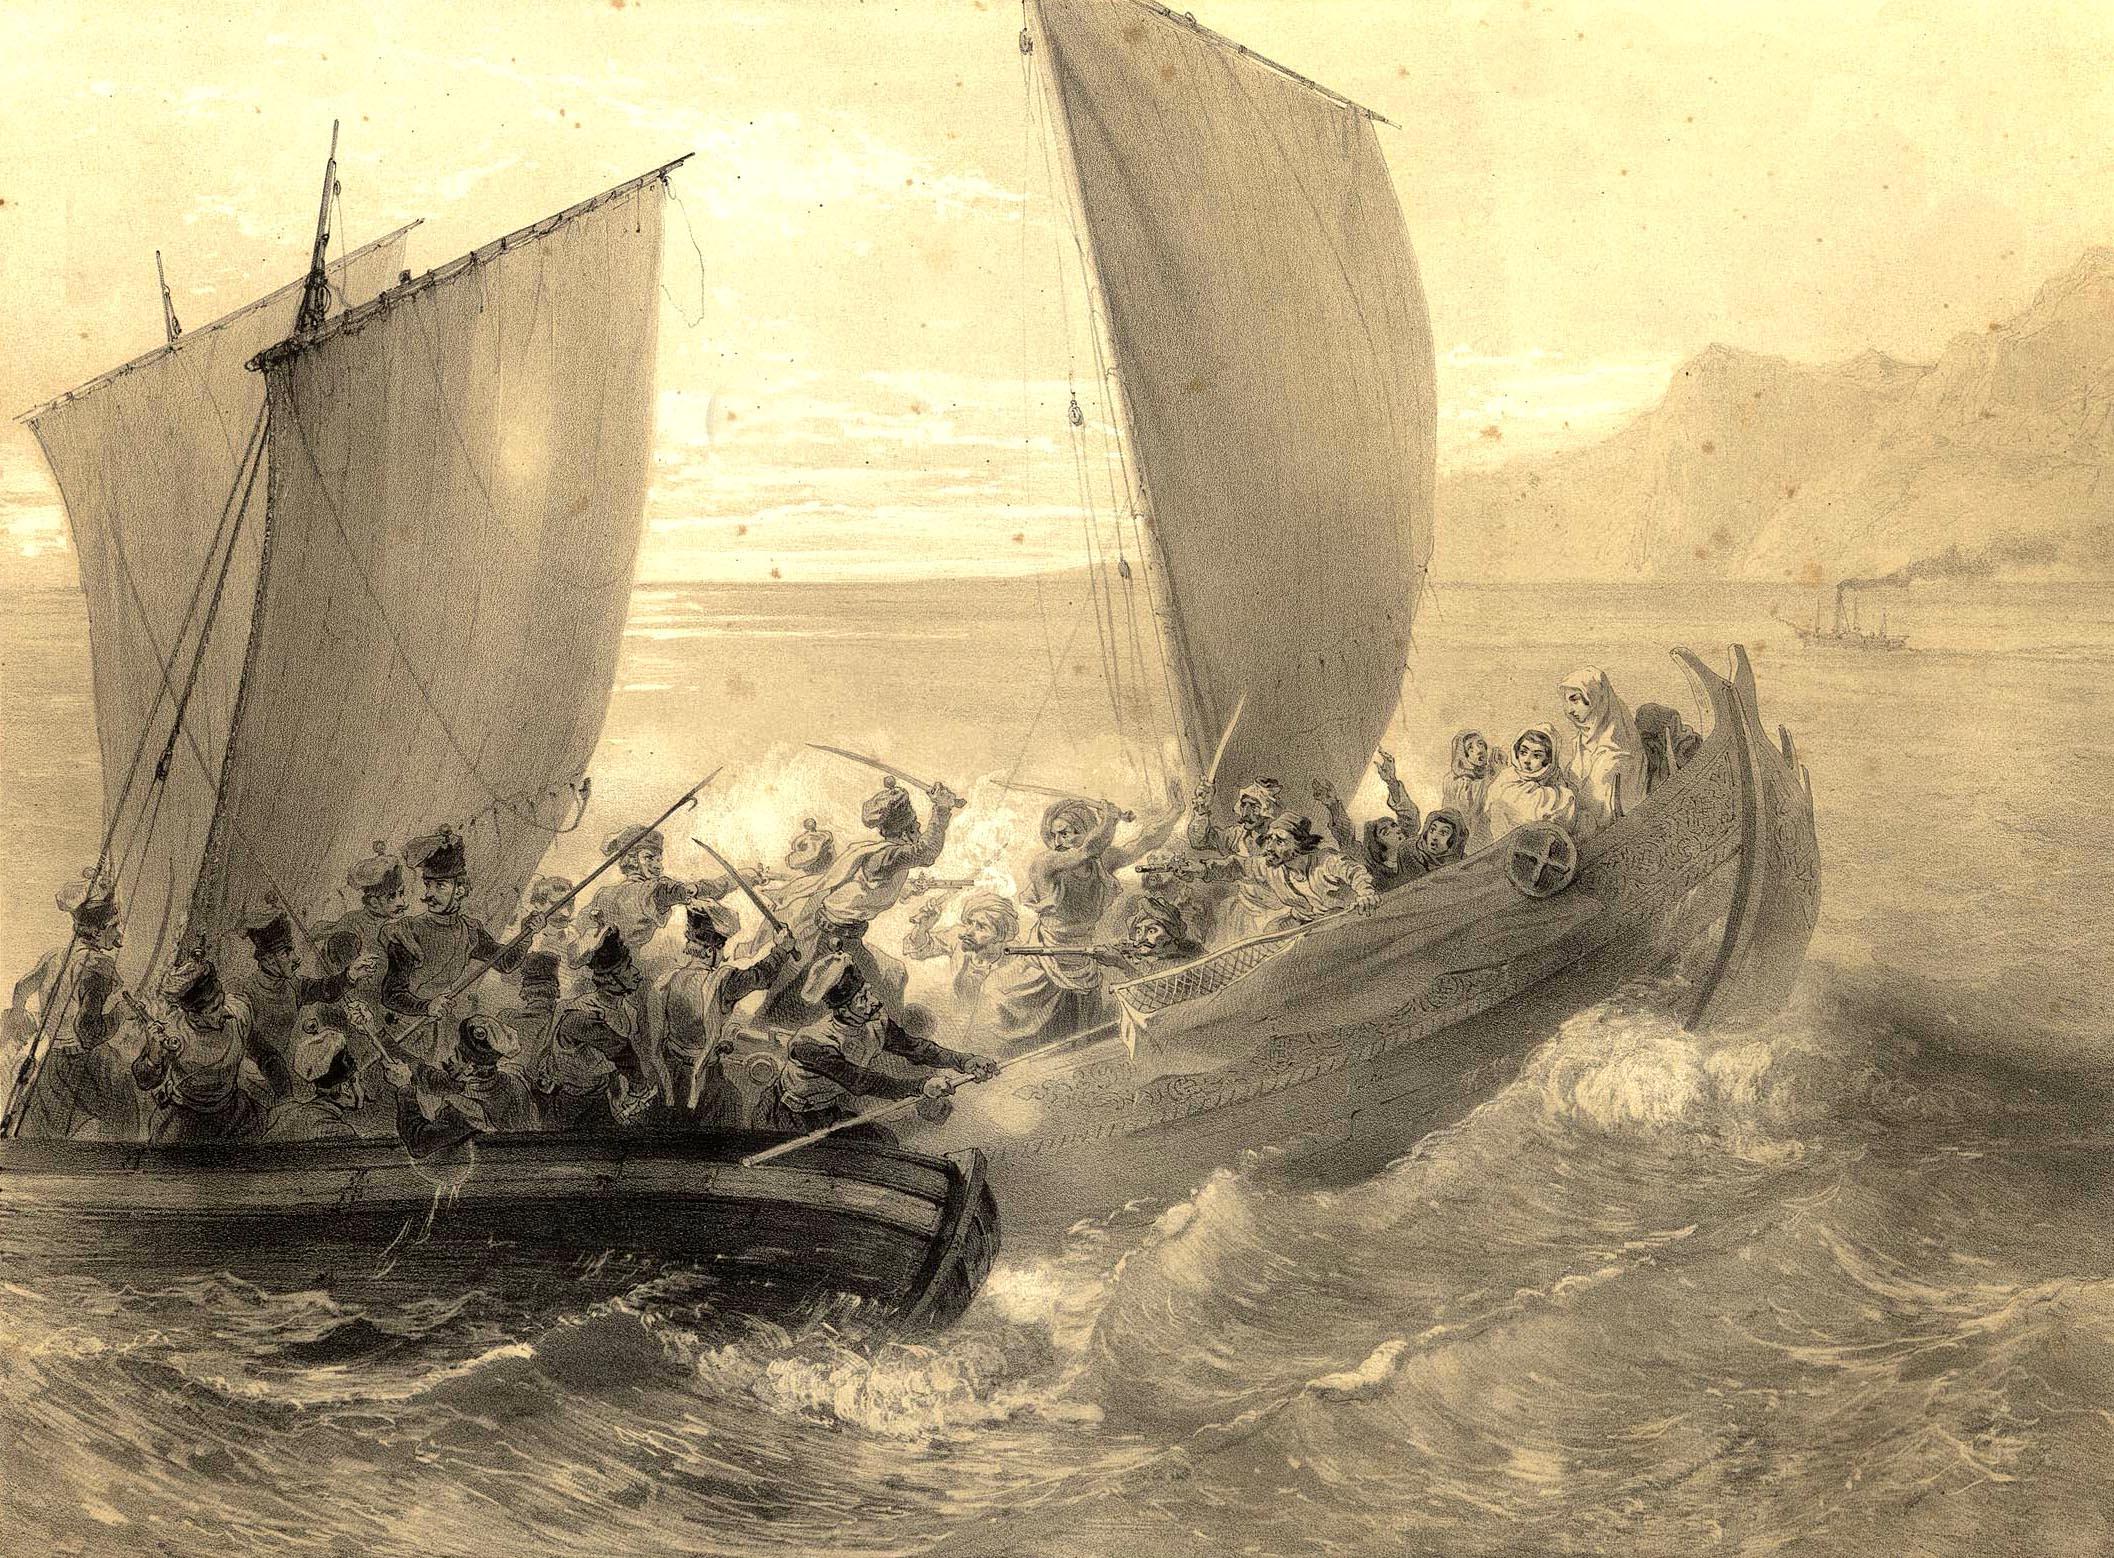 1. Cotes de la Mer Noire. Cosaques d'Azof abordant un corsaire Turc. / Берег Черного моря. Азовские казаки берут на абордаж турецкий корсар